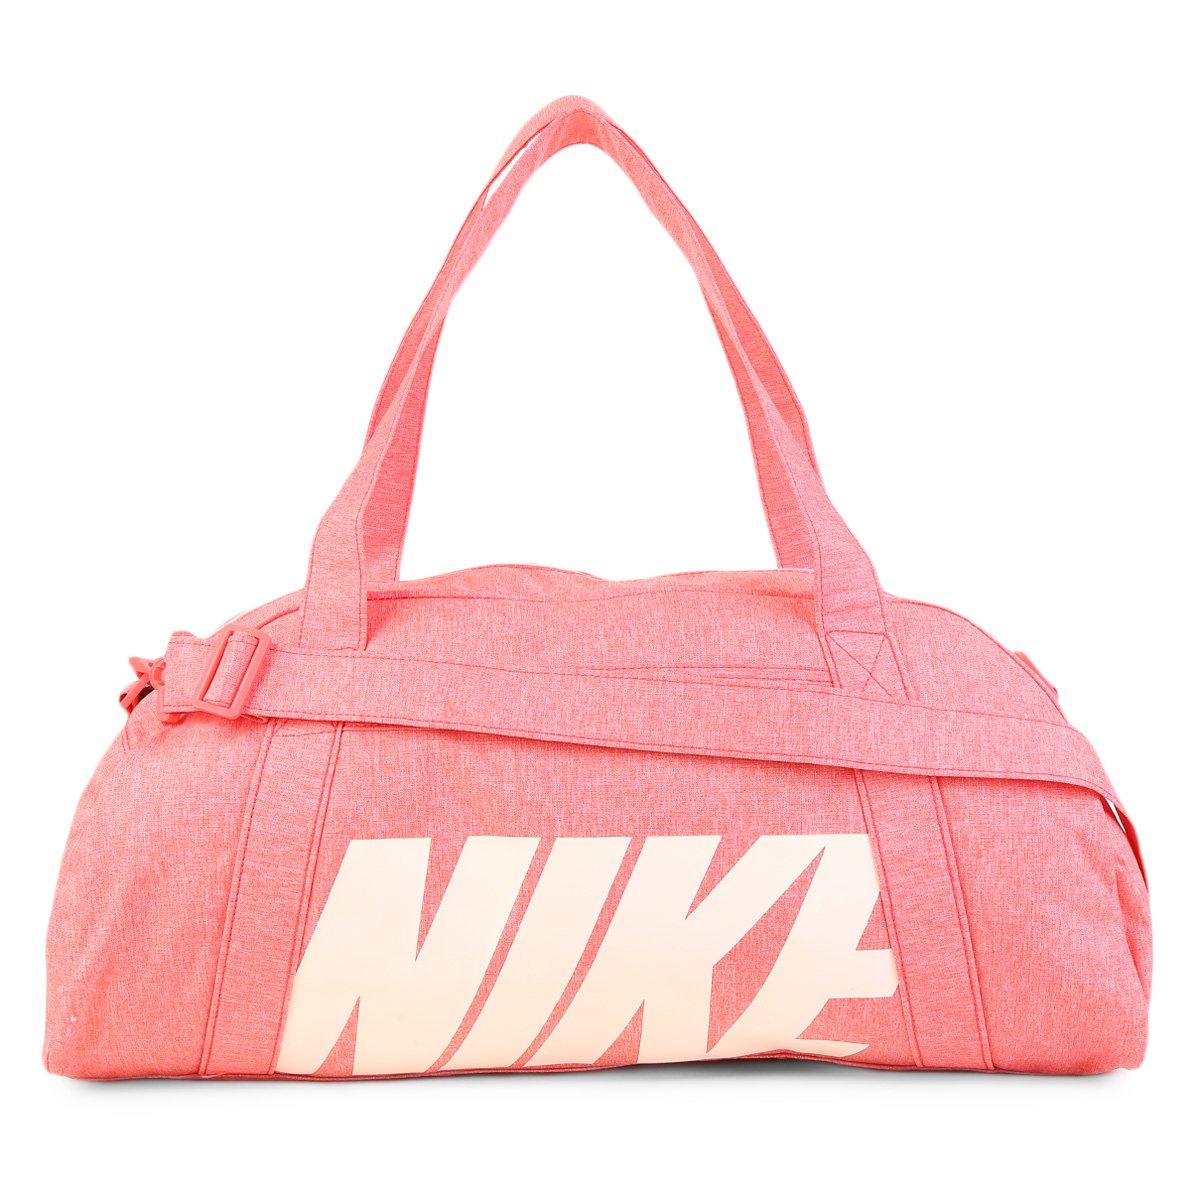 Microordenador Plisado Contribuyente  Bolsa Nike Gym Club Feminina - 30 Litros | Zattini